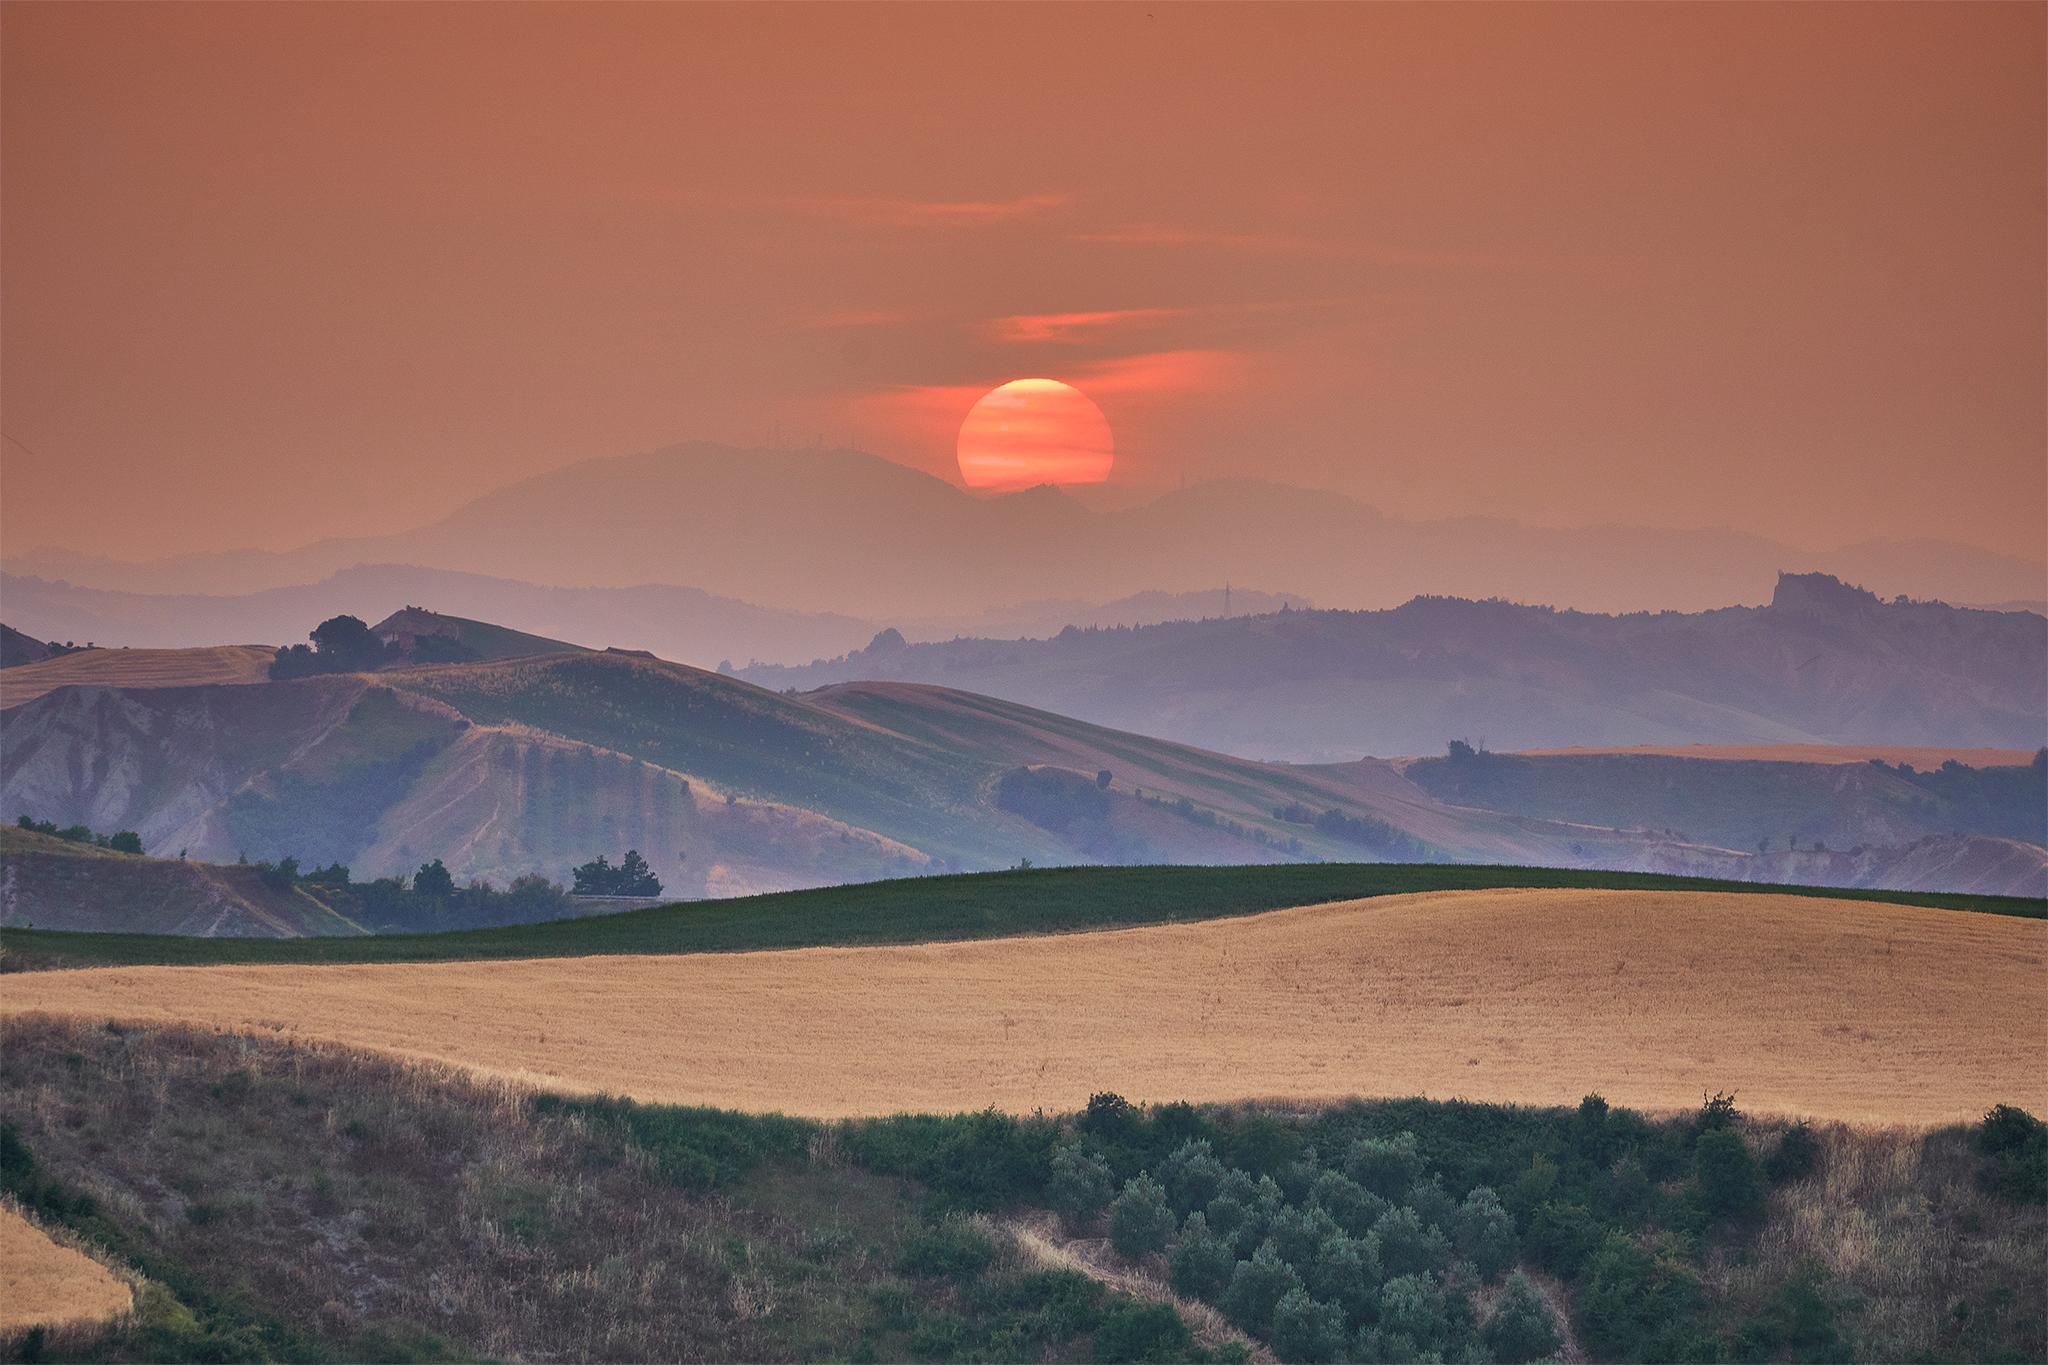 Red sun...